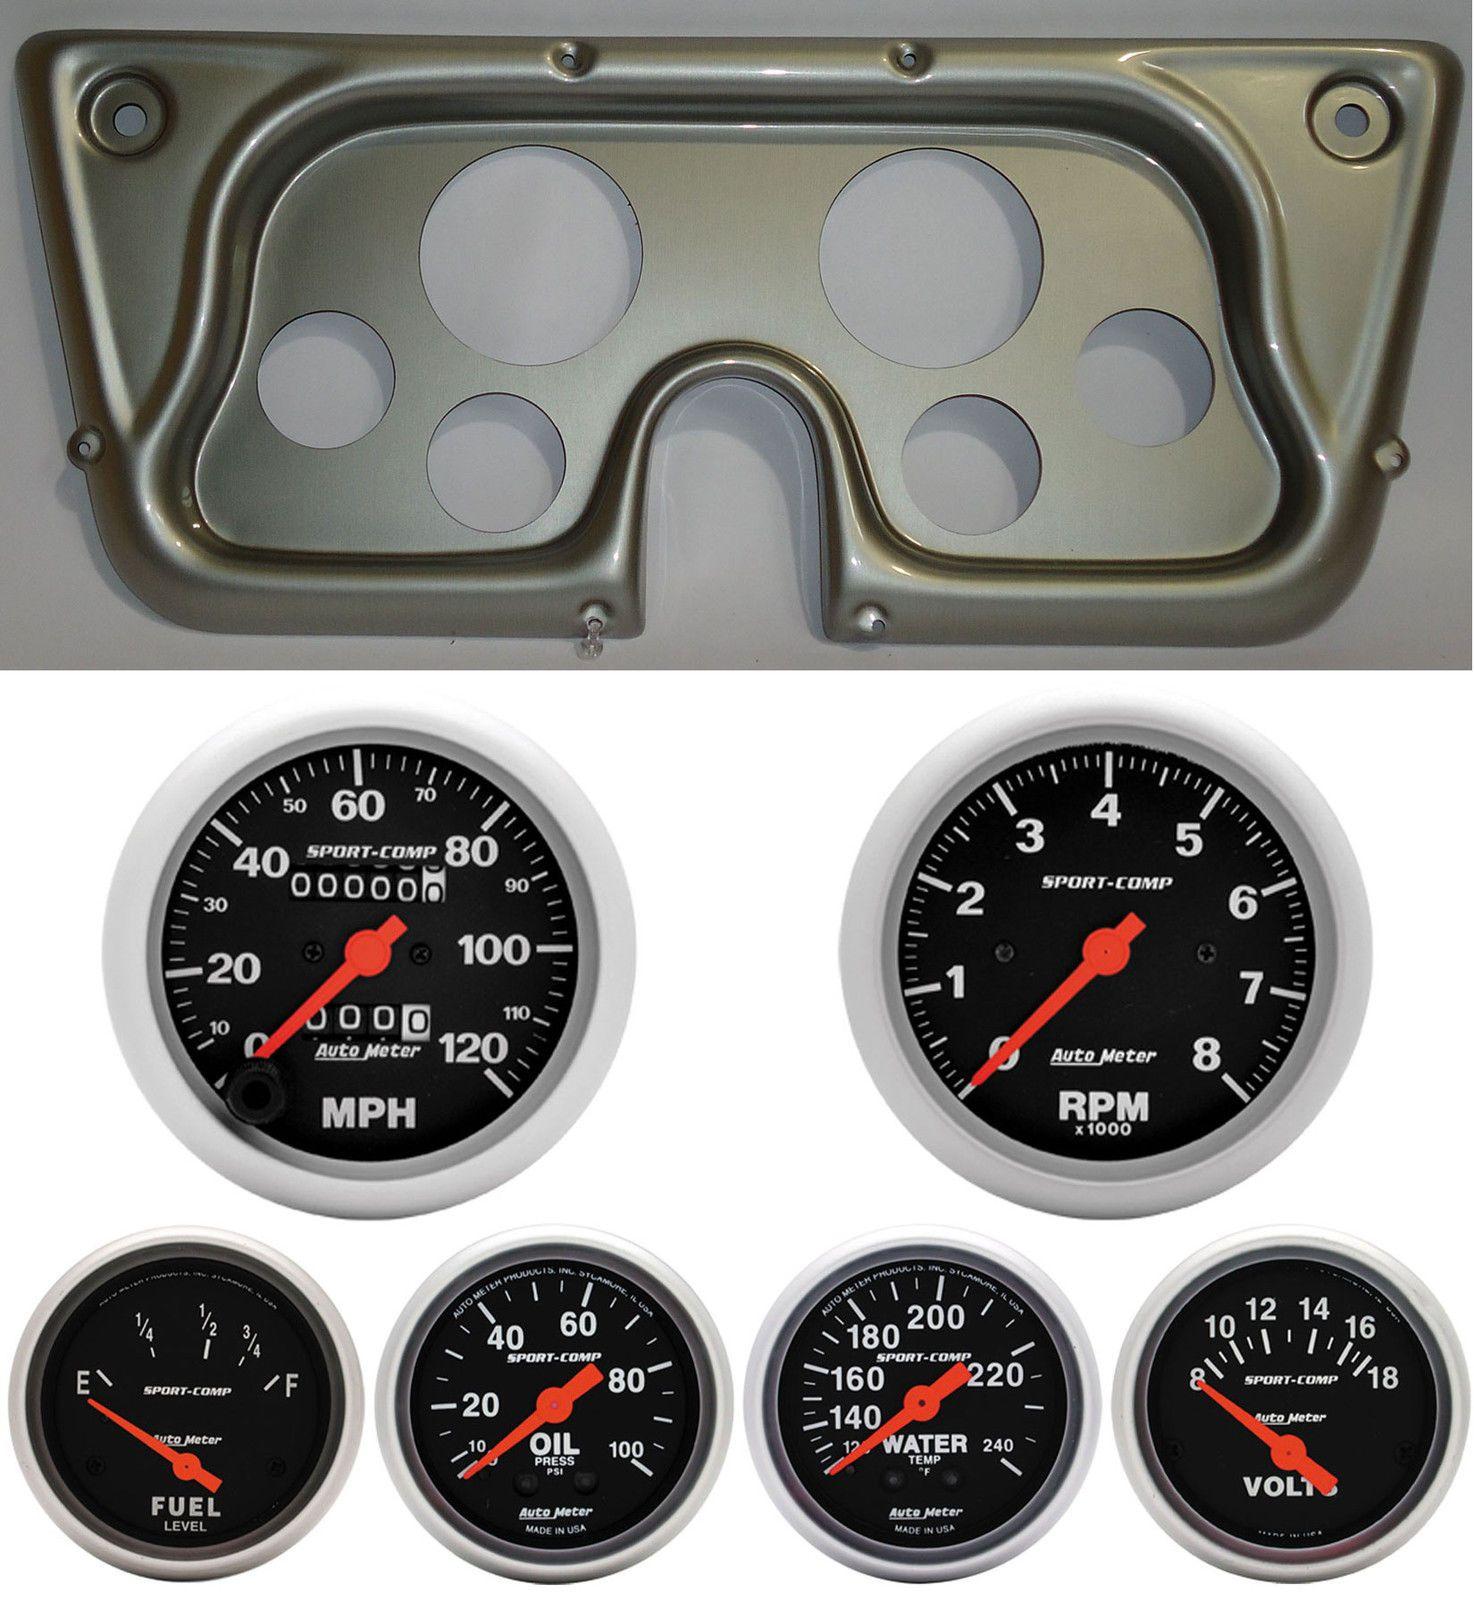 6772 Chevy Truck Silver Dash Carrier Panel w/ AM Sport